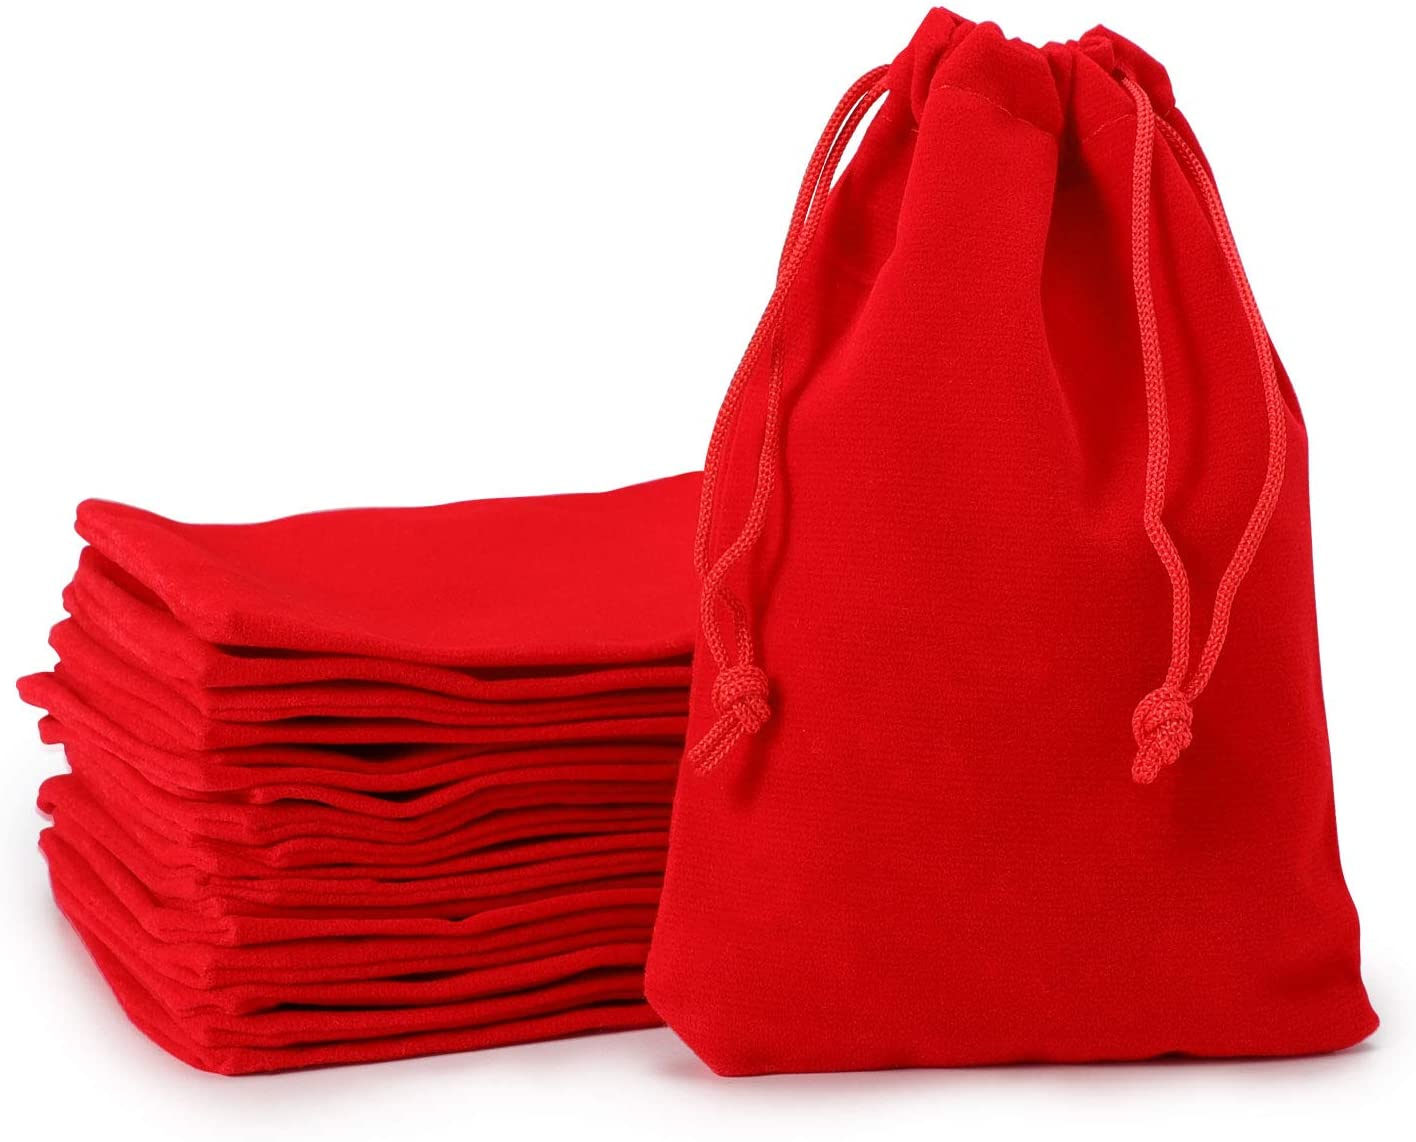 Velvet Bags Drawstring, EUSOAR 20 pcs 4 x 6